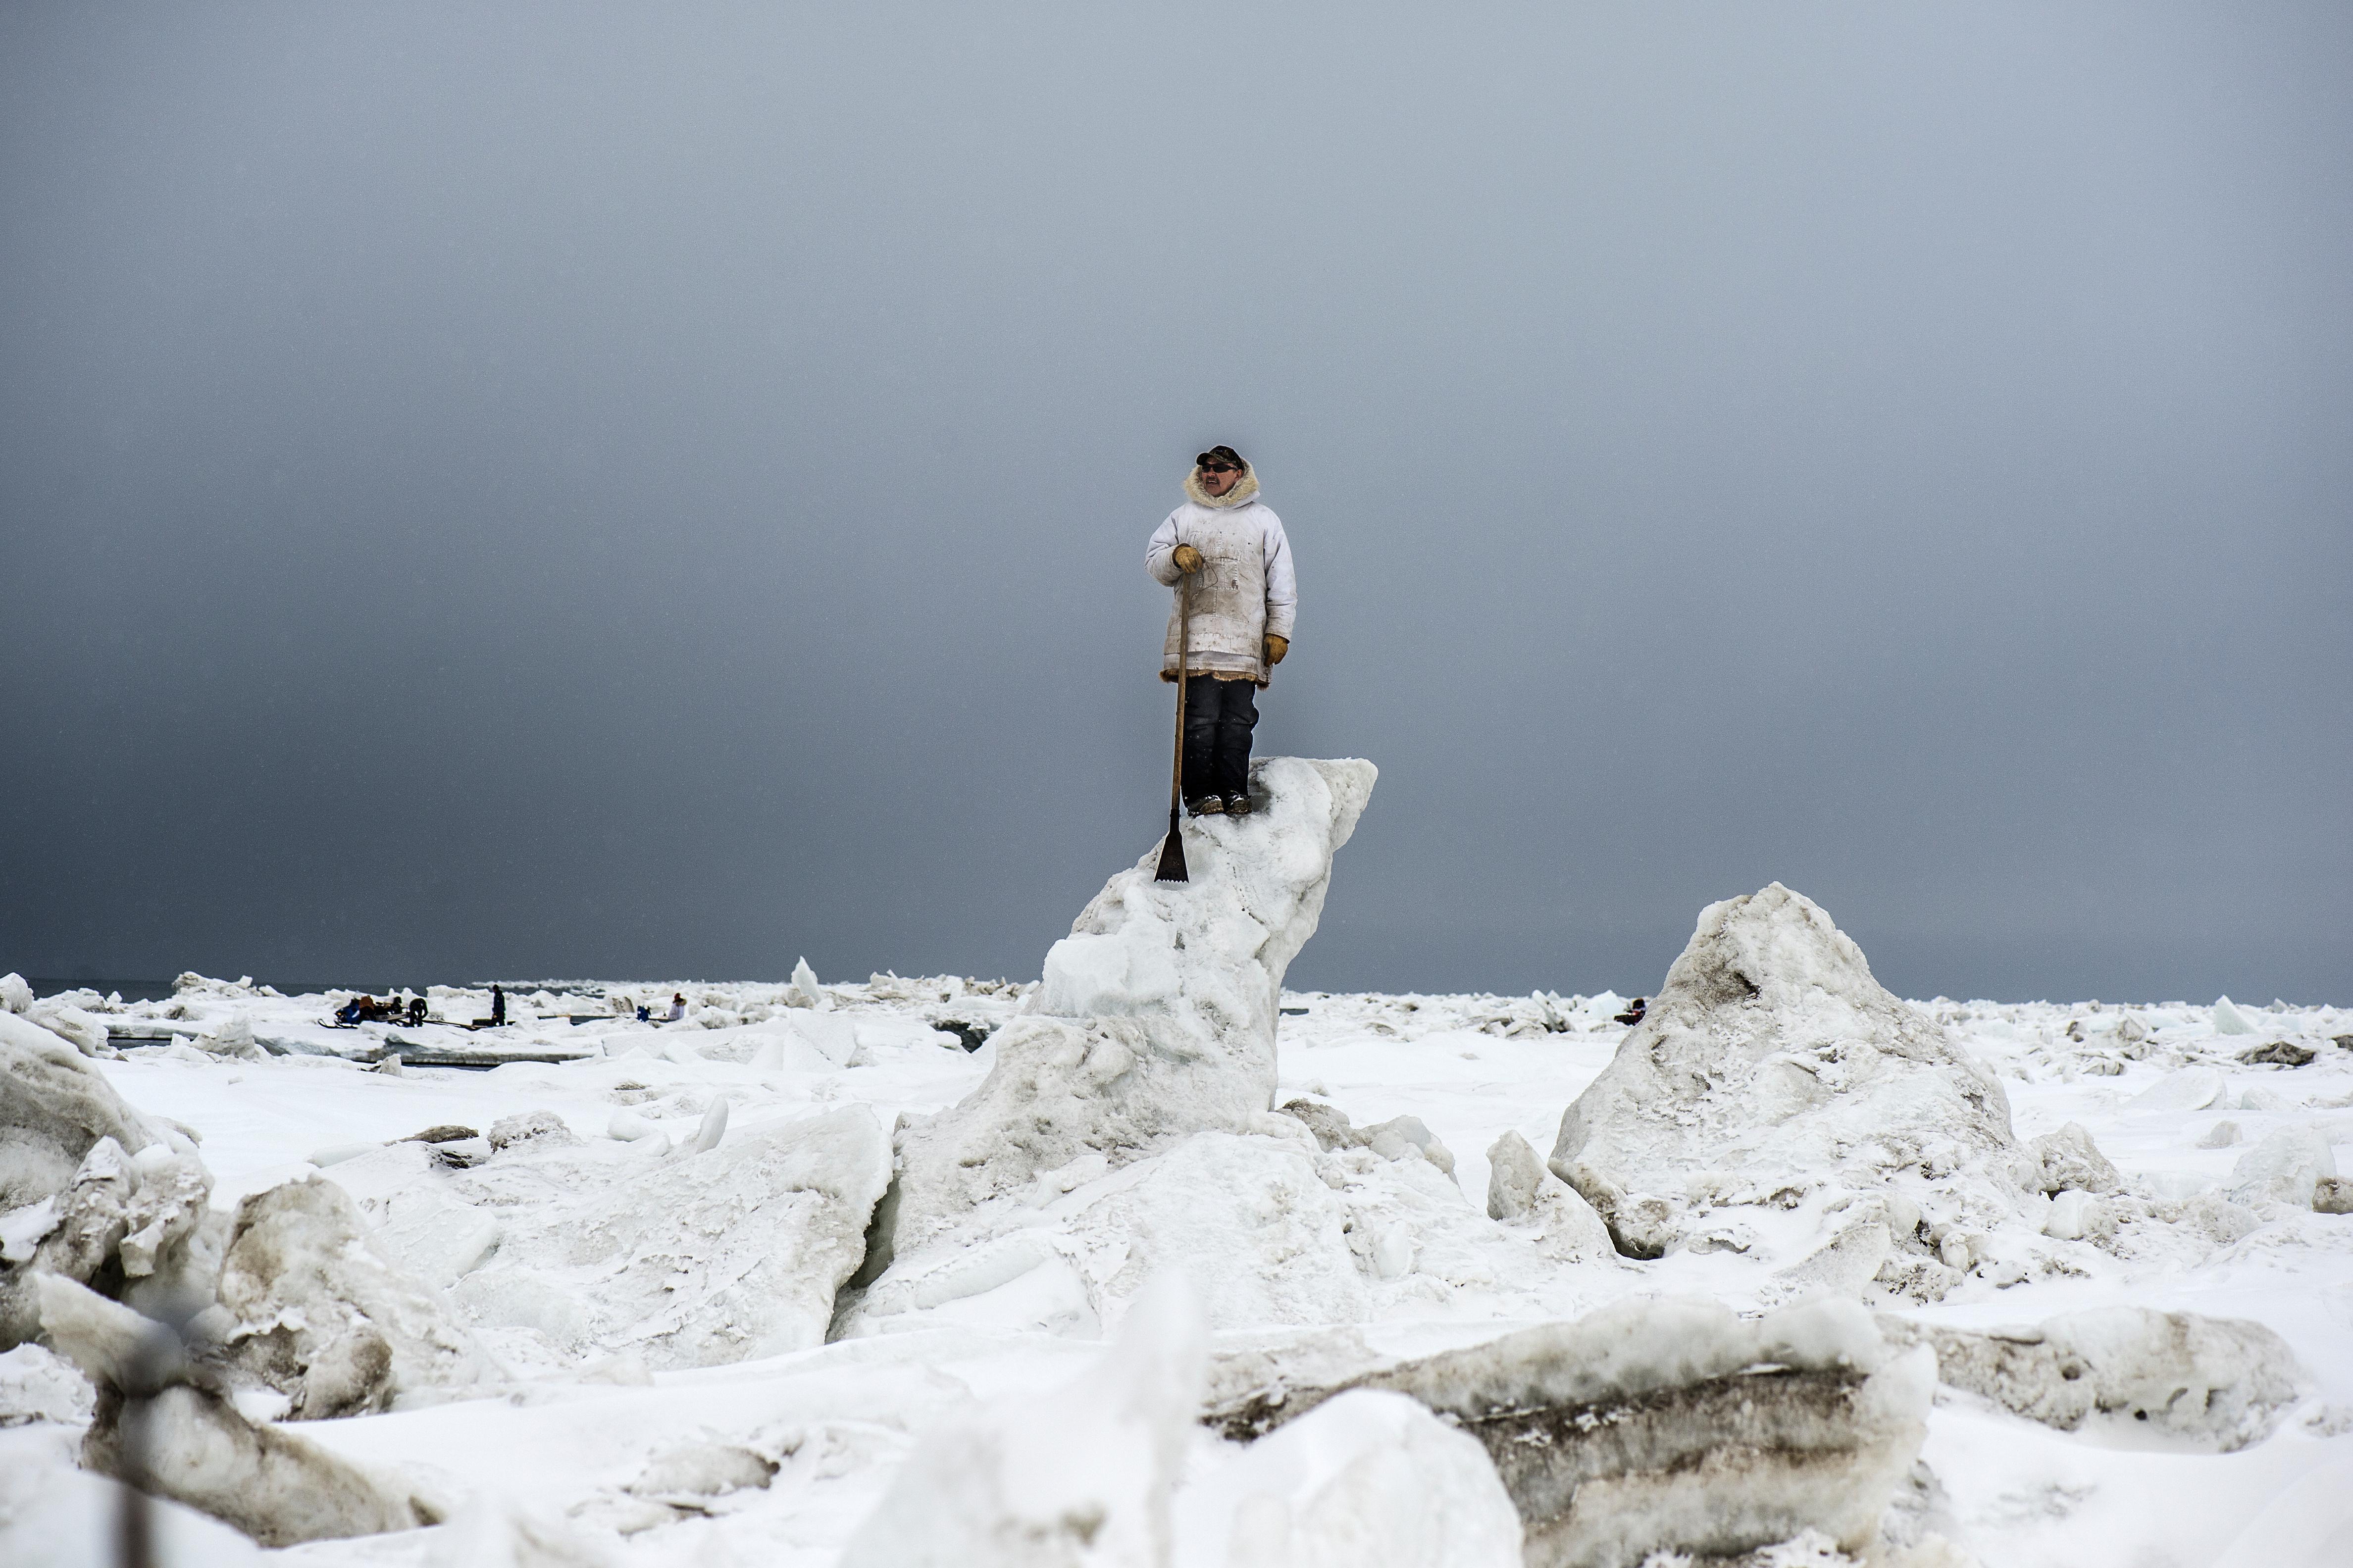 Arctic: a Double Polar Expedition - photo essay